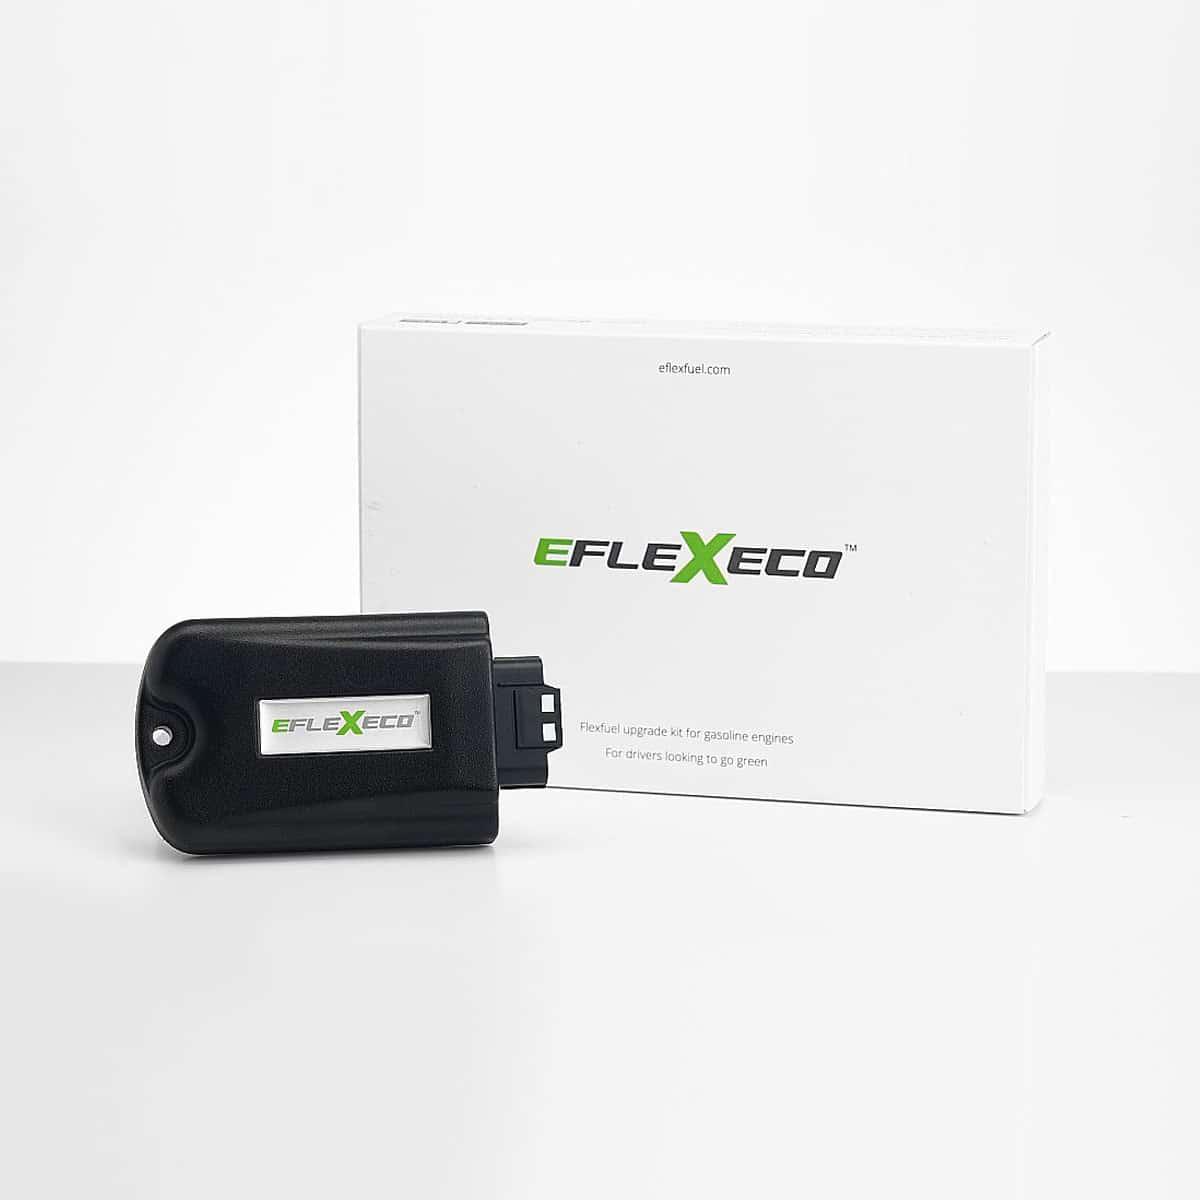 Le kit de conversion eFlexEco